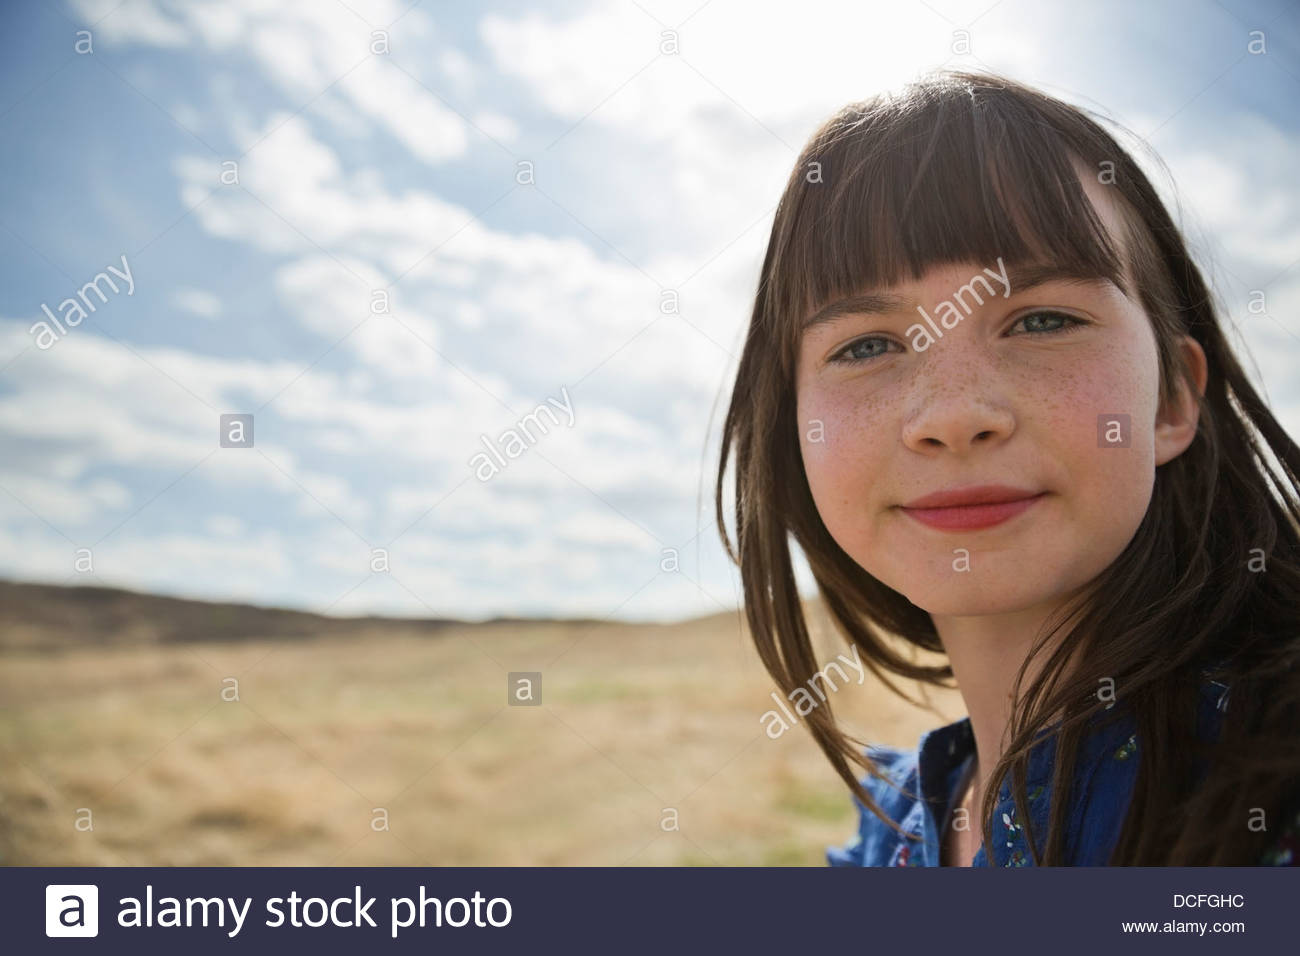 Portrait of cute schoolgirl looking at camera - Stock Image